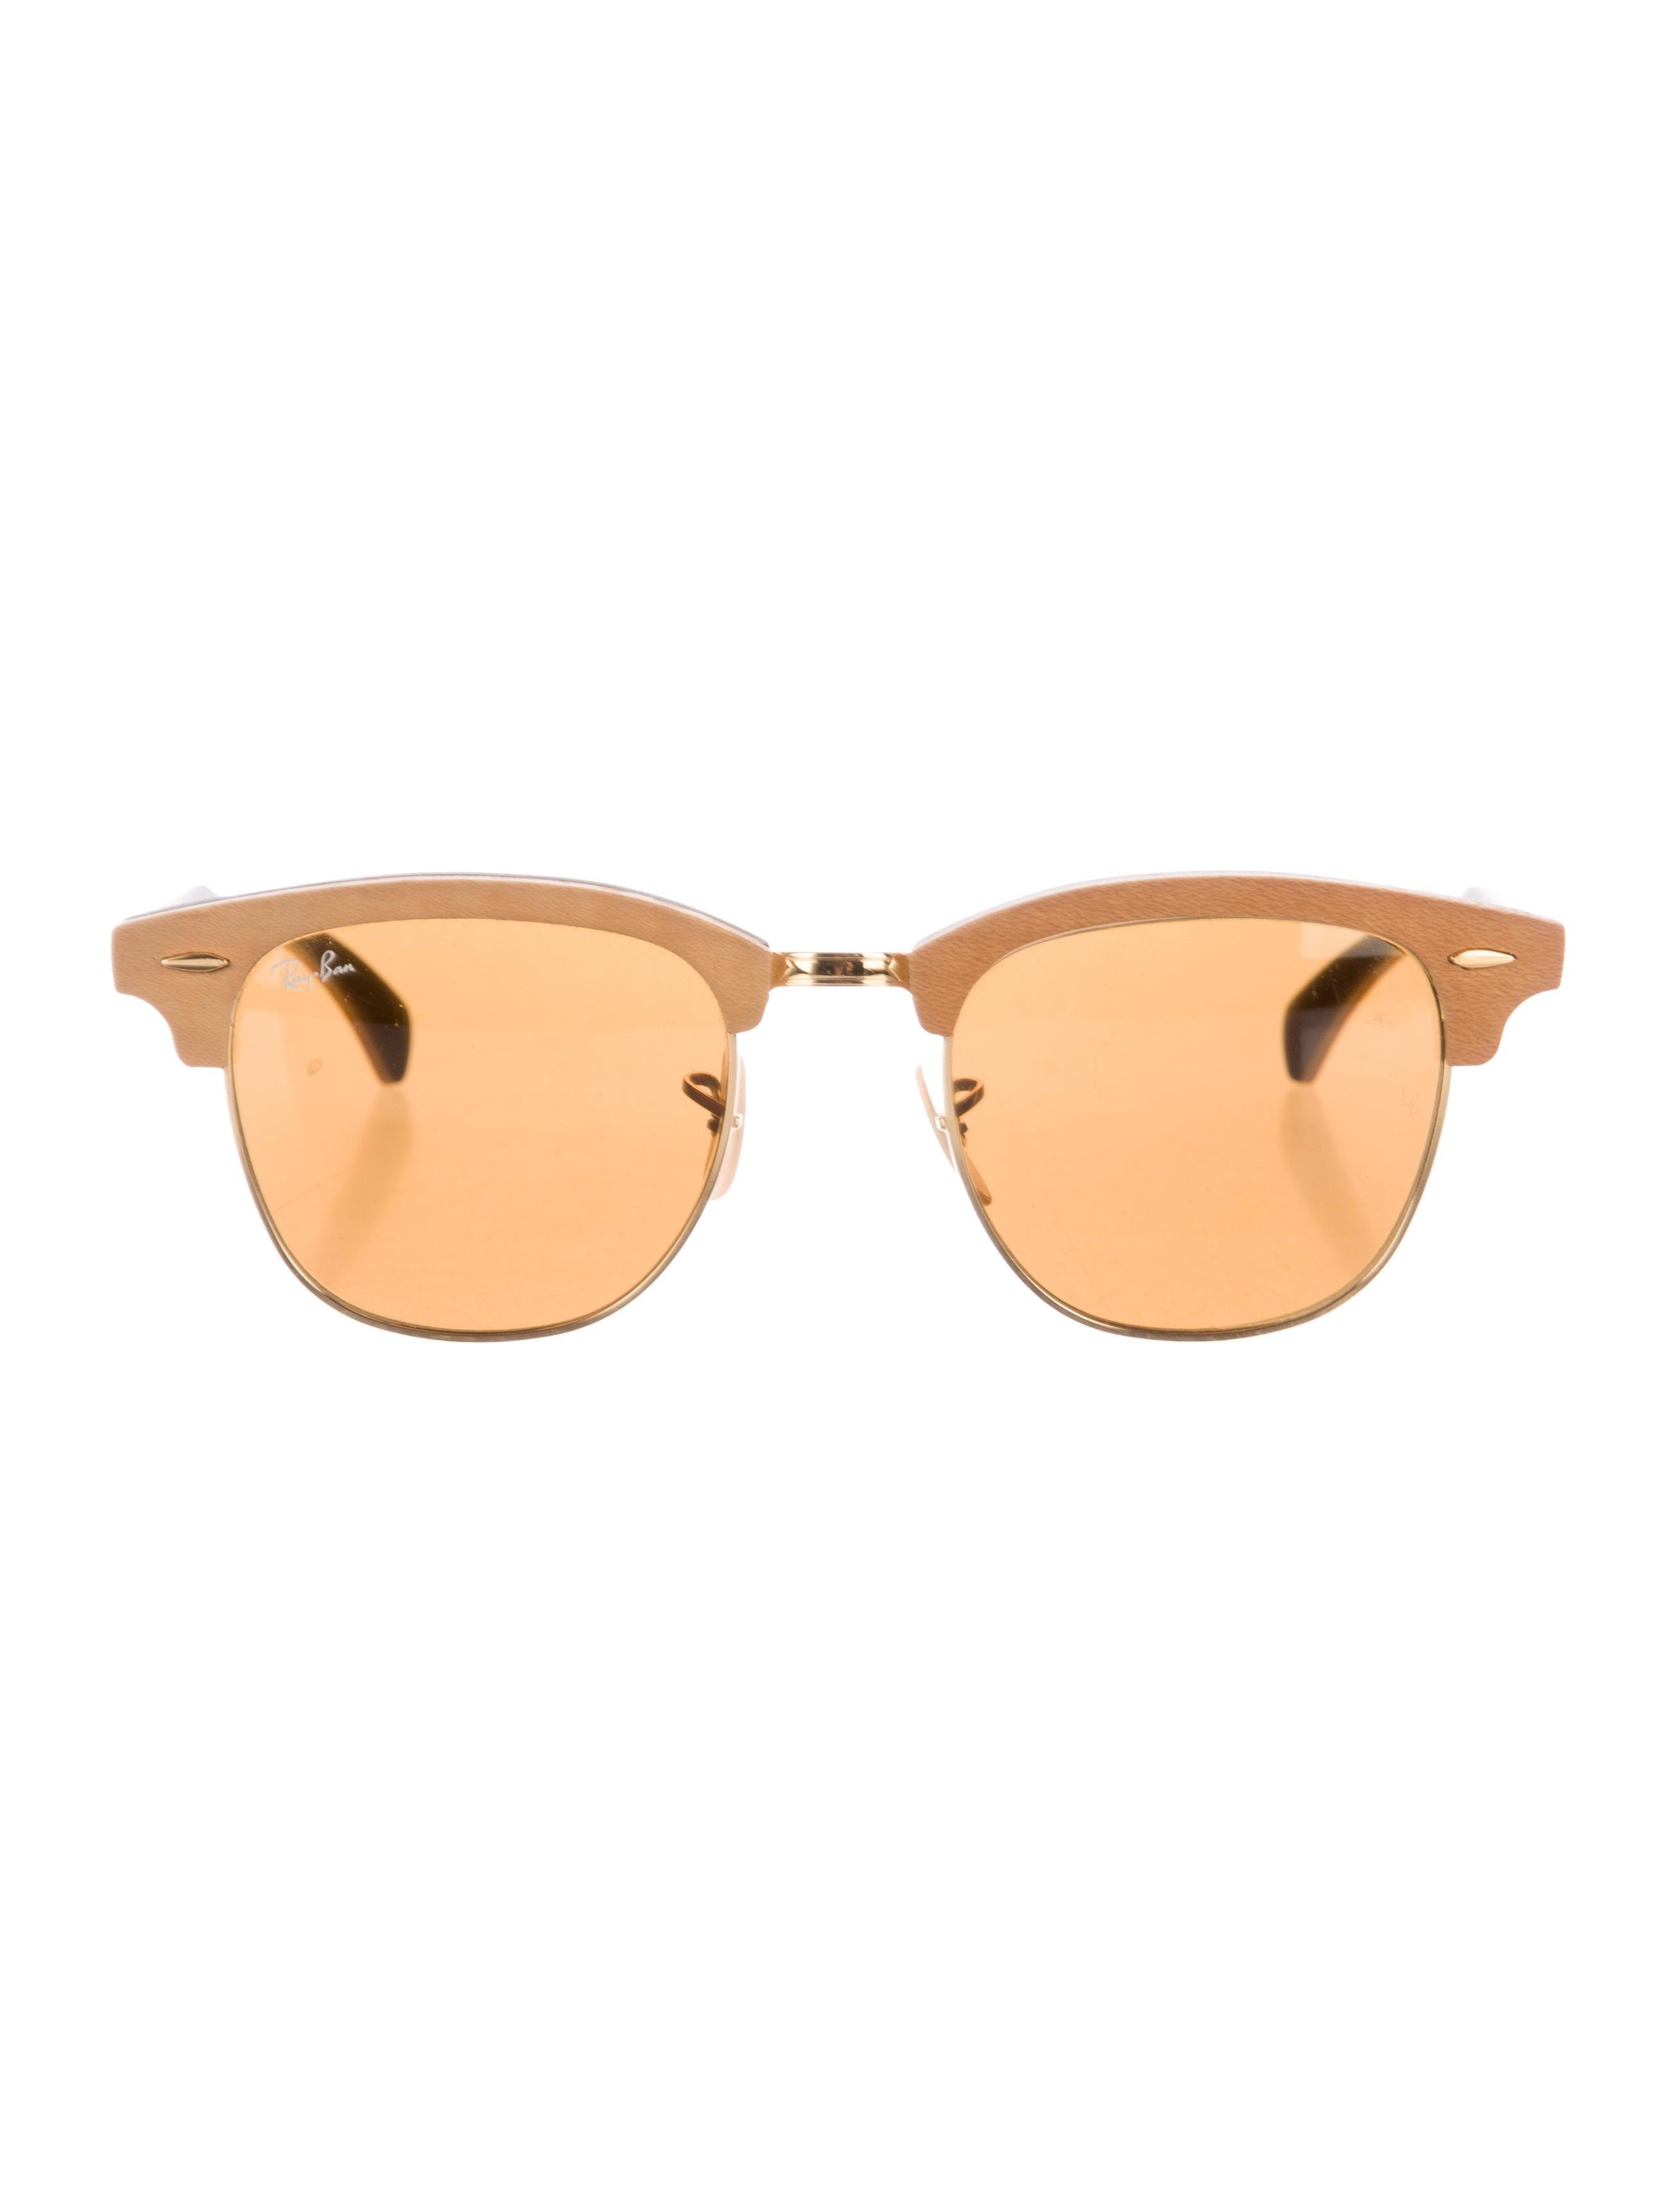 f8e85bf165 Ray Ban Clubmaster Wooden Eyeglass Case « Heritage Malta